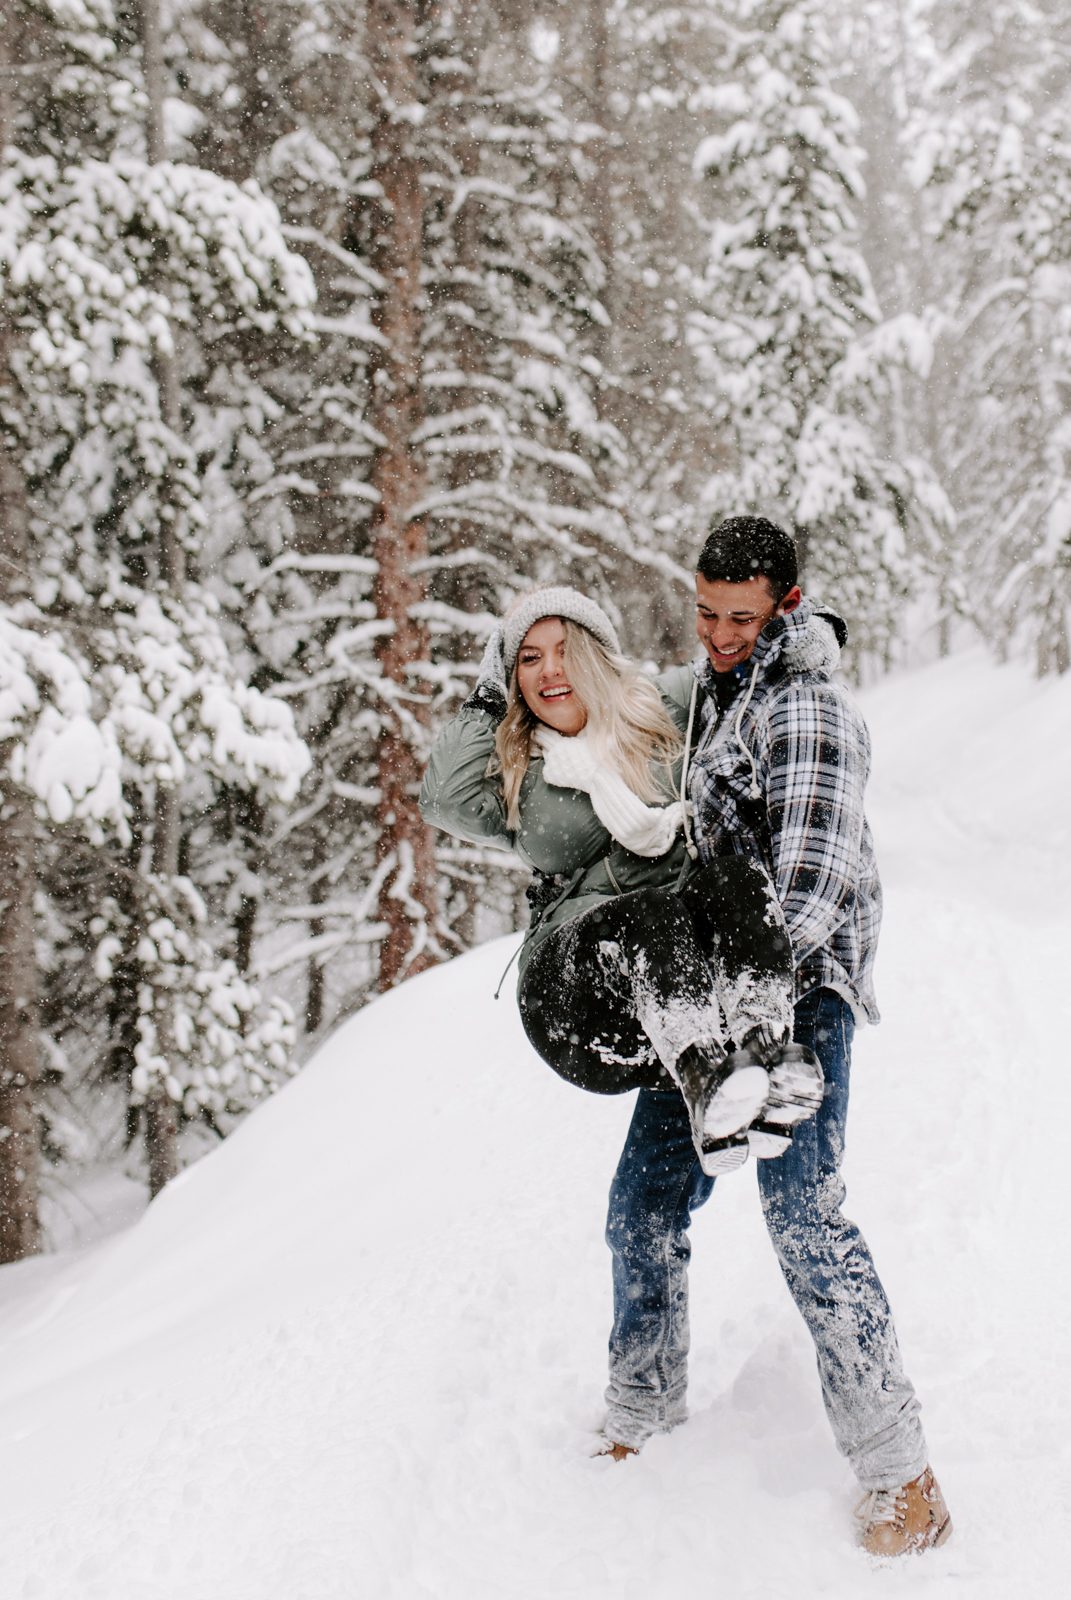 Vanessa & Danny Snow Rocky Mountain National Park Engagement Elopement Photography Photographer-49.jpg